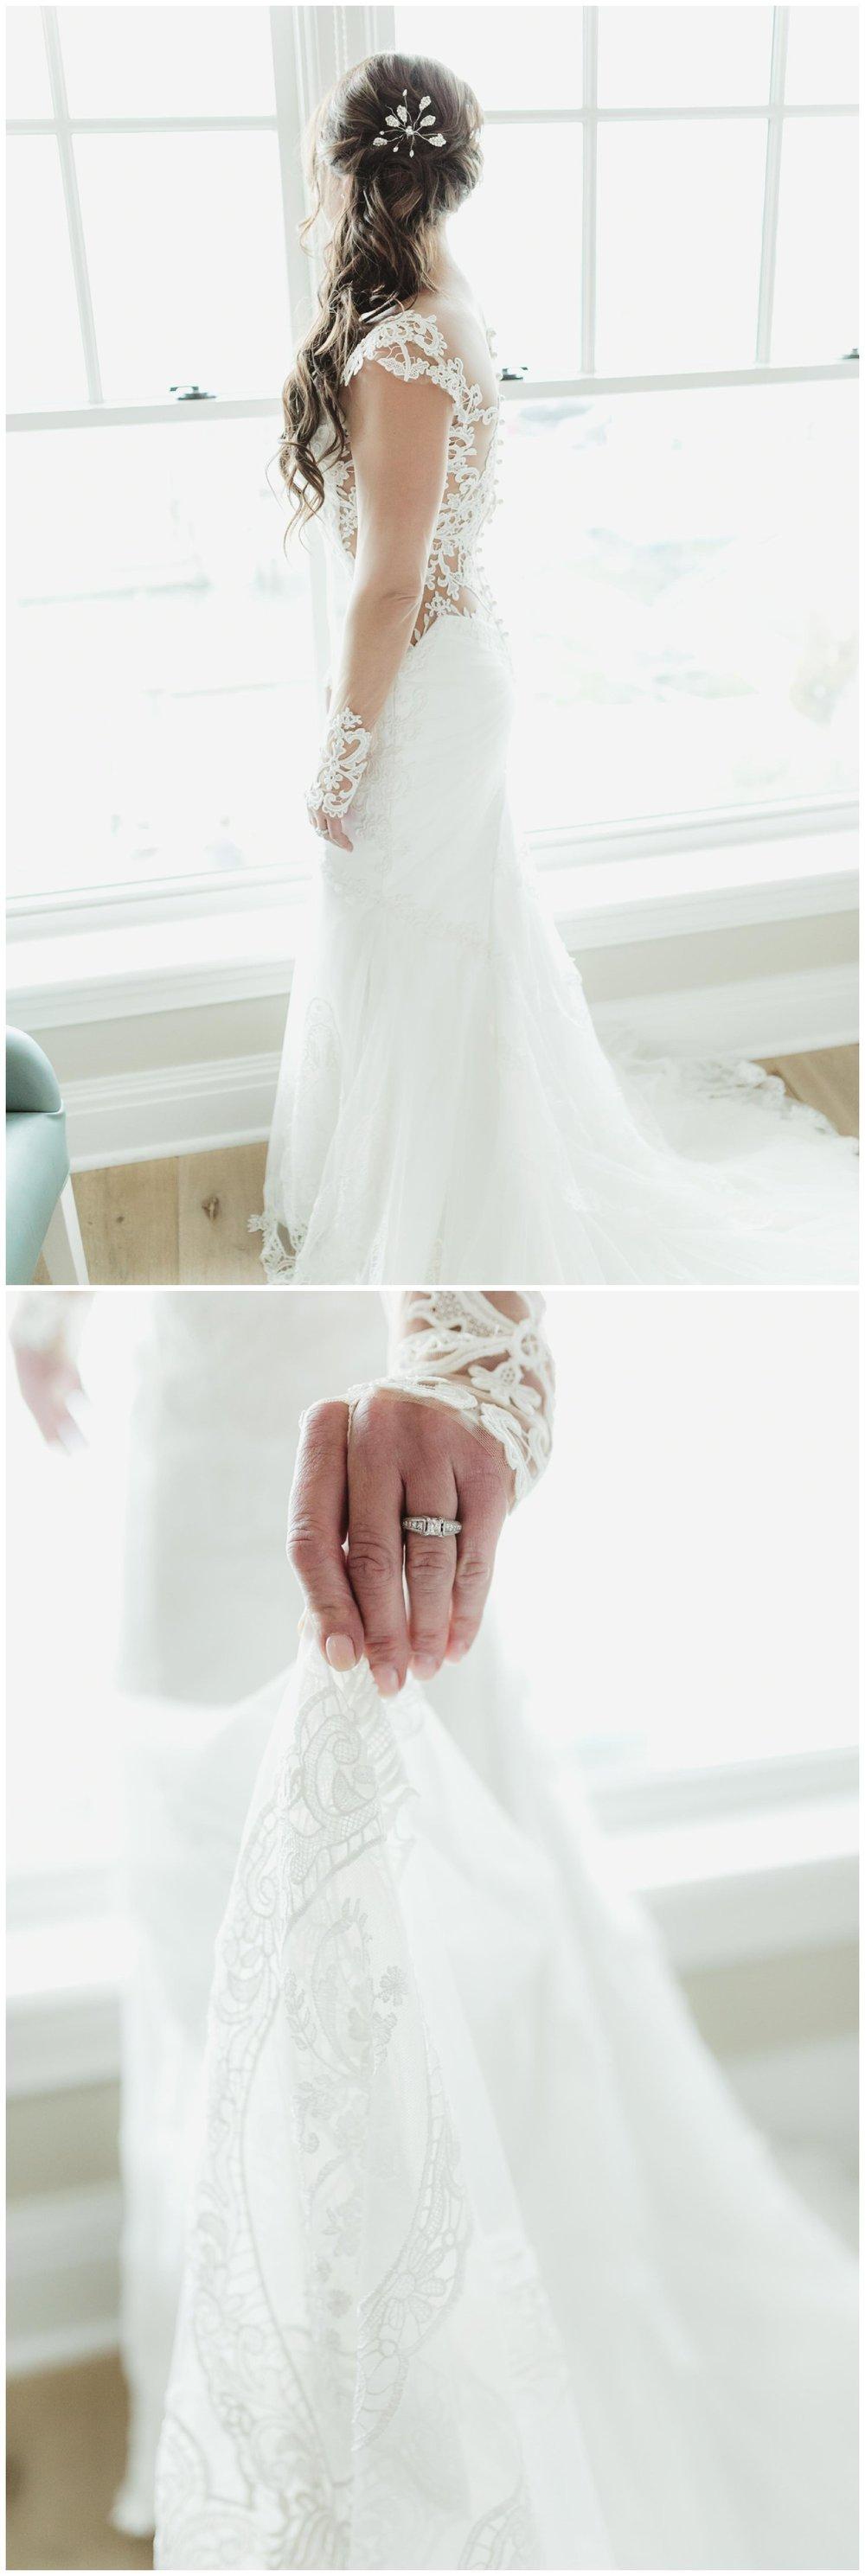 JillandLennon_TheReeds_ShelterHaven_StoneHarbor_NJ_NewJersey__SouthJersey_Wedding_Photographer_MagdalenaStudios_0303.jpg